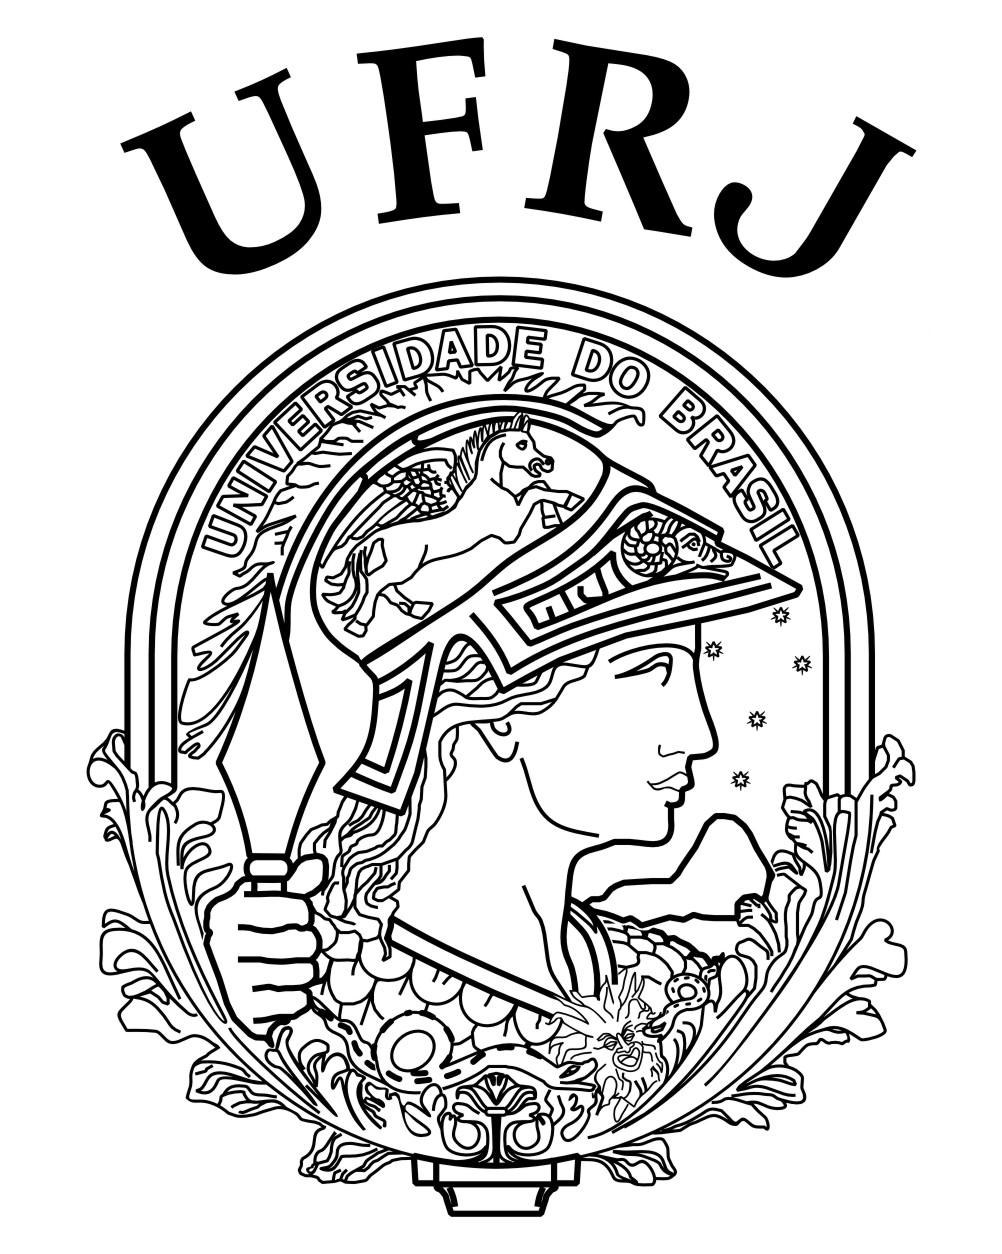 logo_ufrj